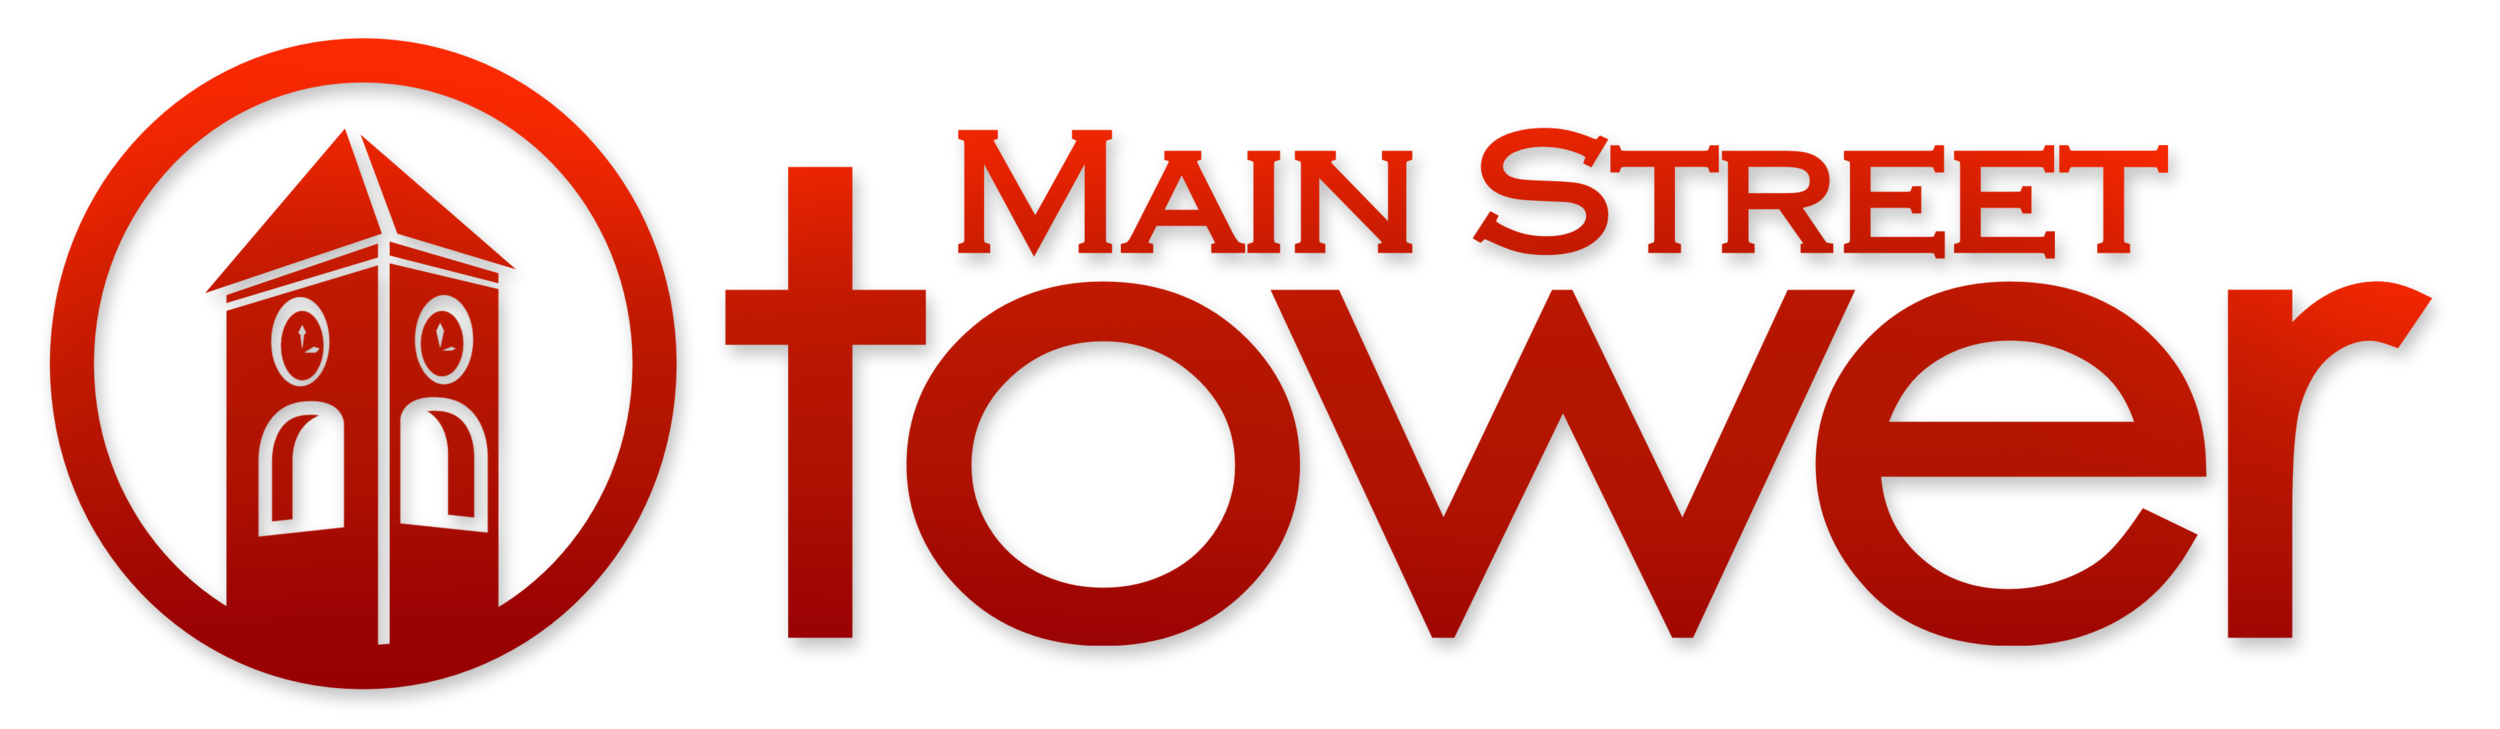 Main Street Tower